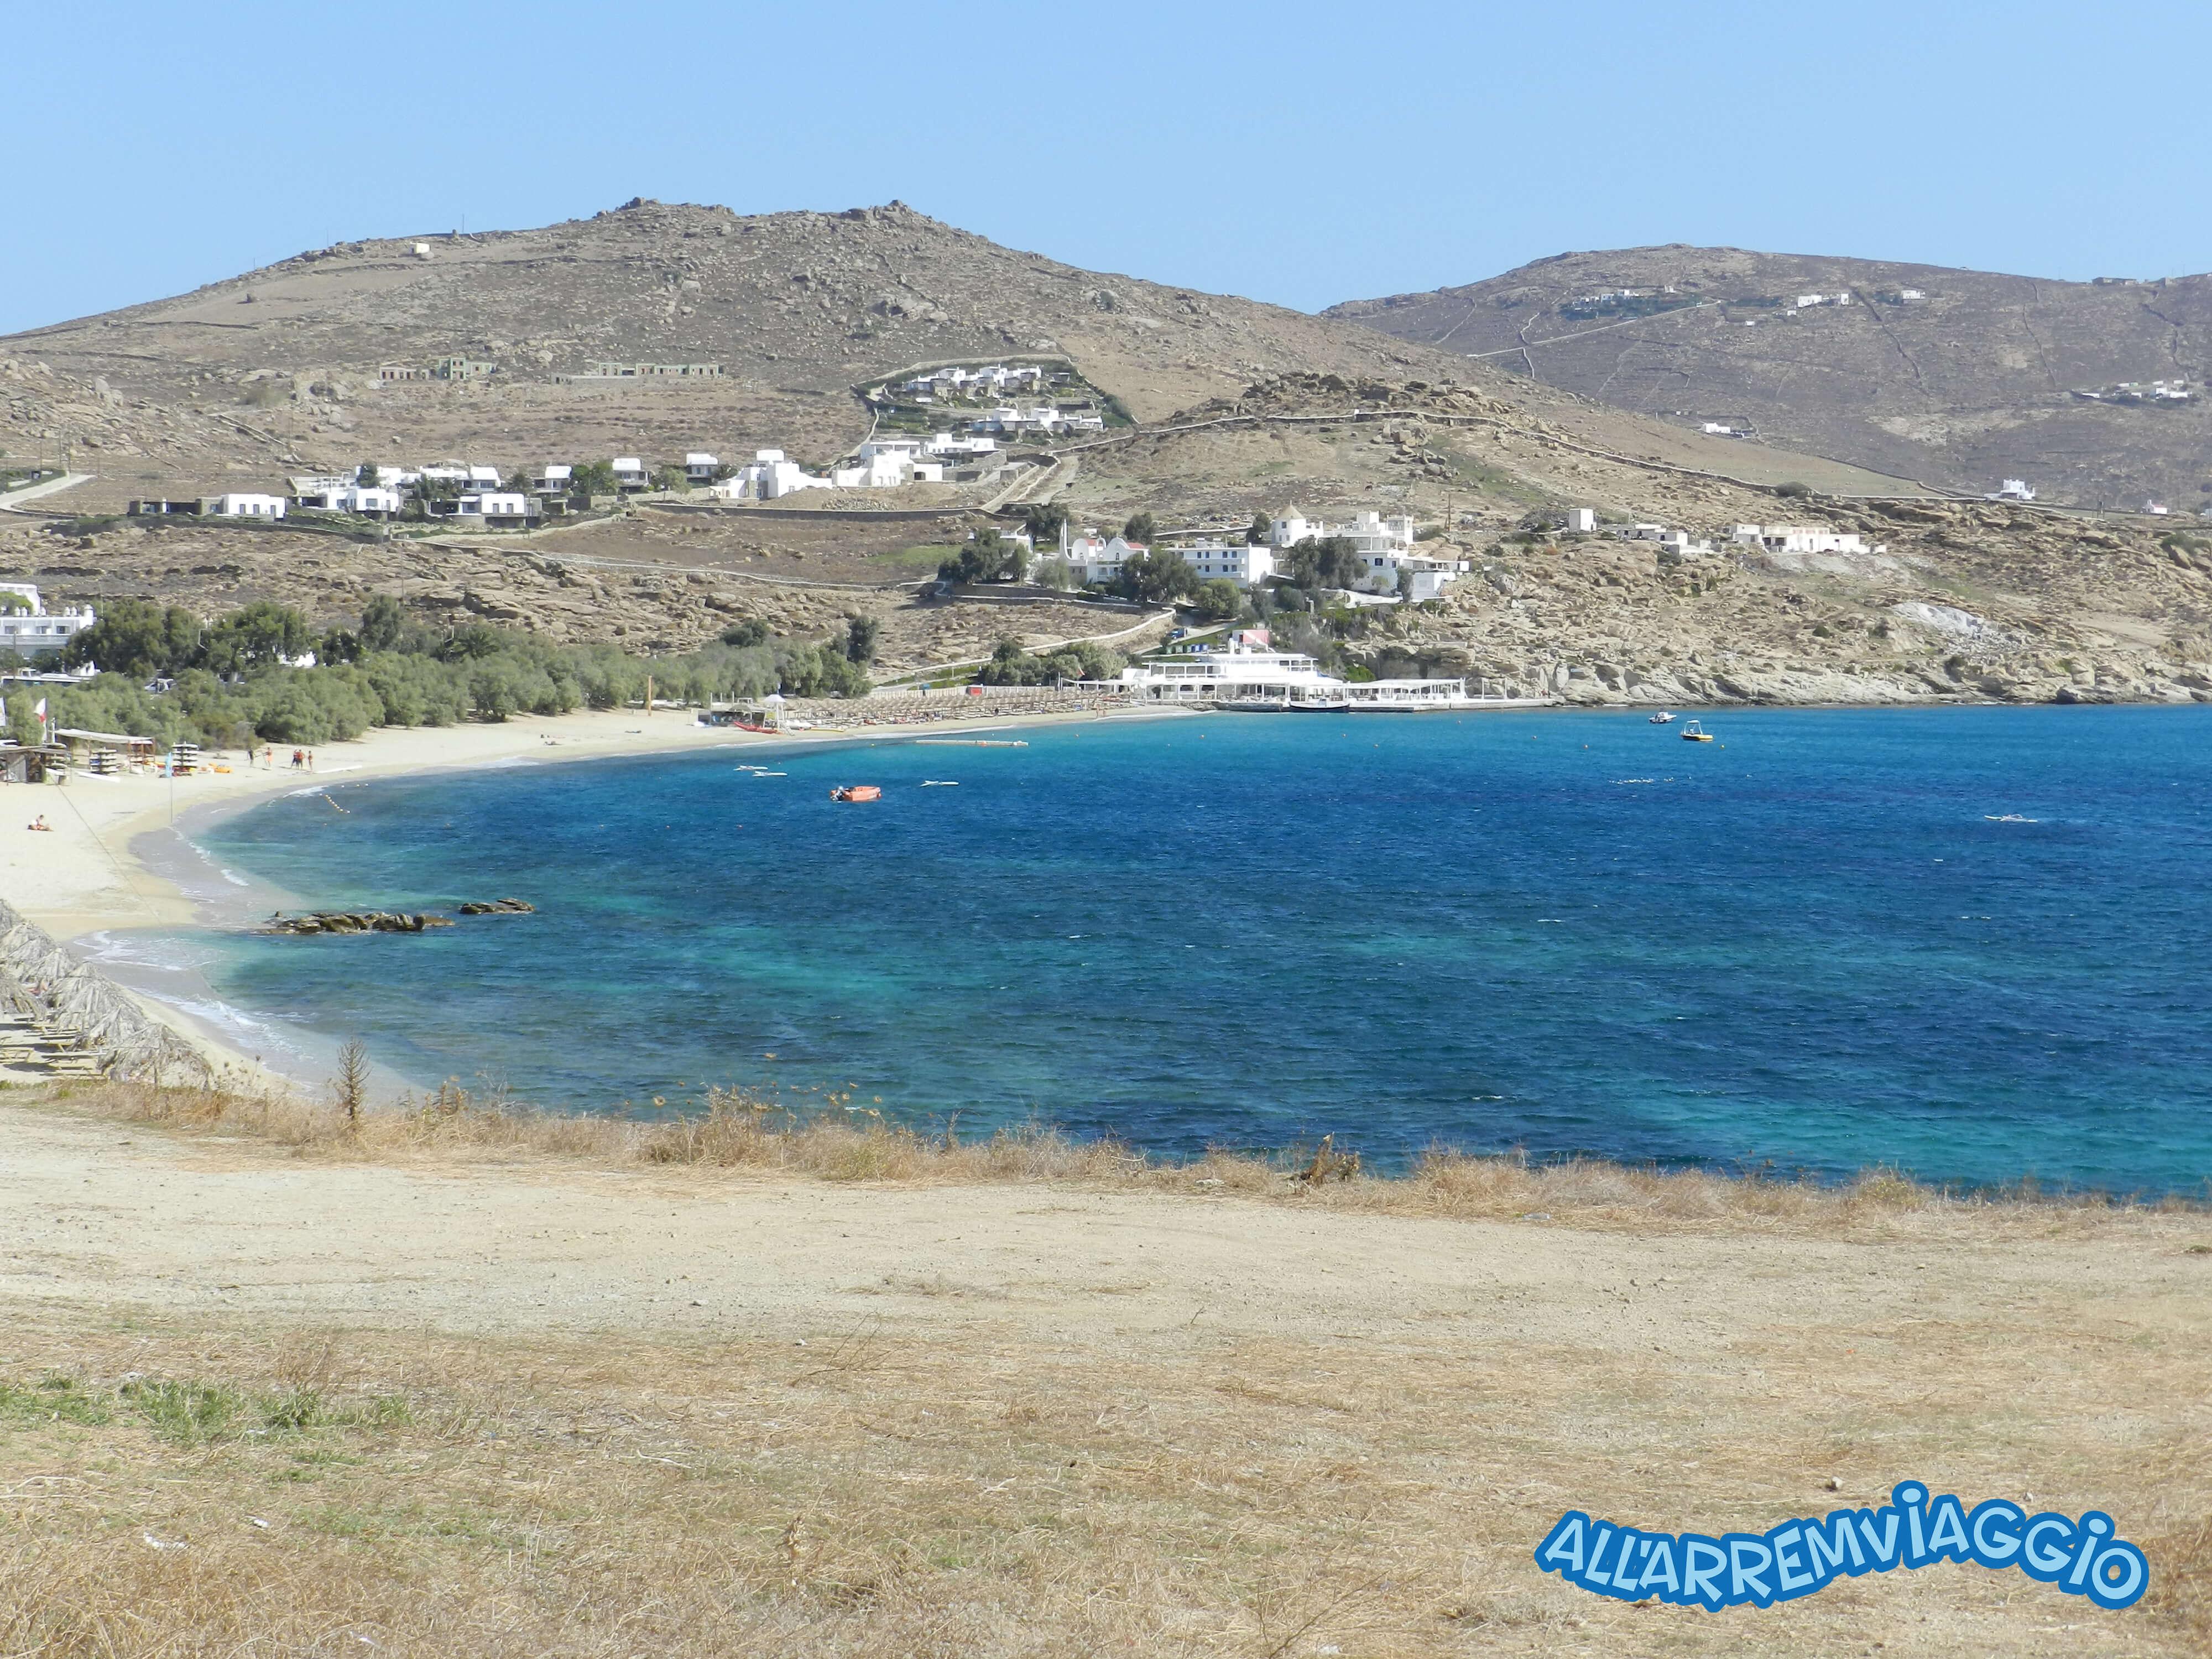 spiagge, imperdibili, mykonos, cicladi, grecia, mare, spiaggedasogno, fokos, le più, belle, spiagge, di, Mykonos